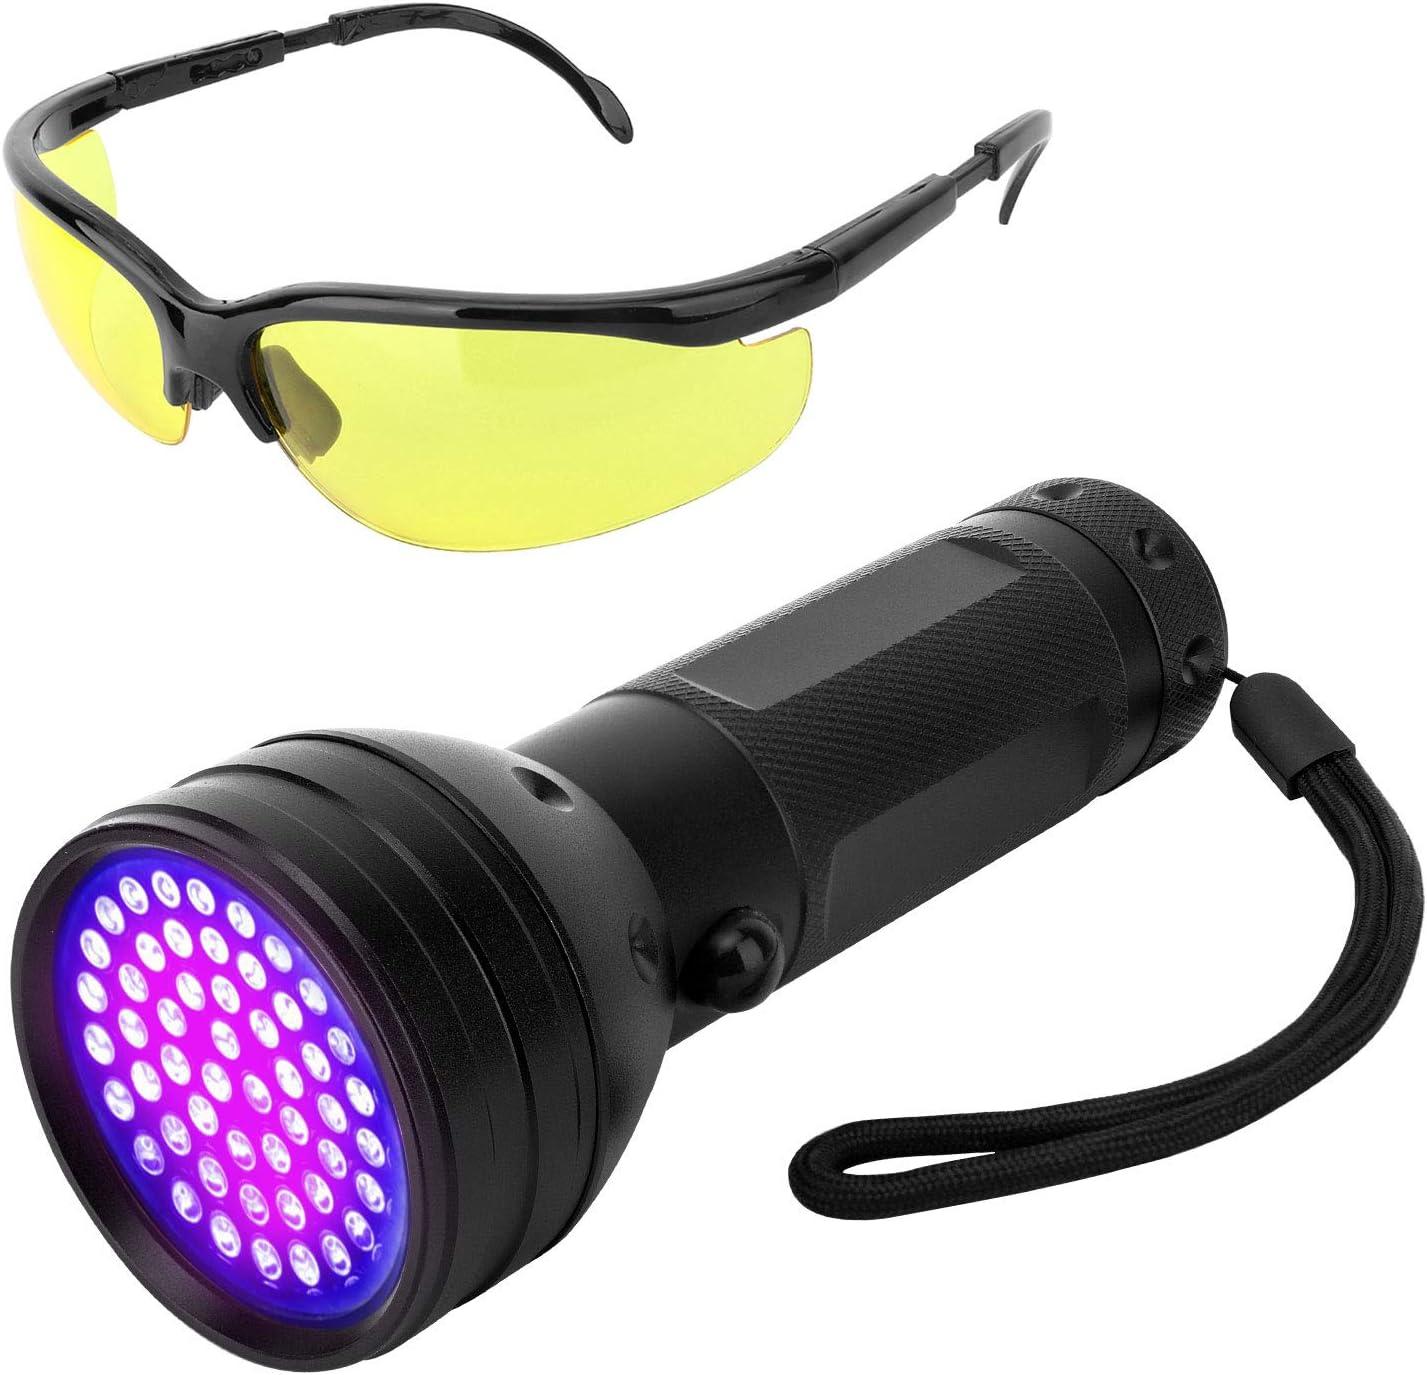 Vavopaw UV Linterna, Luz Negra 395nm Linterna Ultravioleta con Gafas de Protección UV de Clase de Eficiencia Energética A+ para Detectar Manchas de Orina de Mascotas - Negro